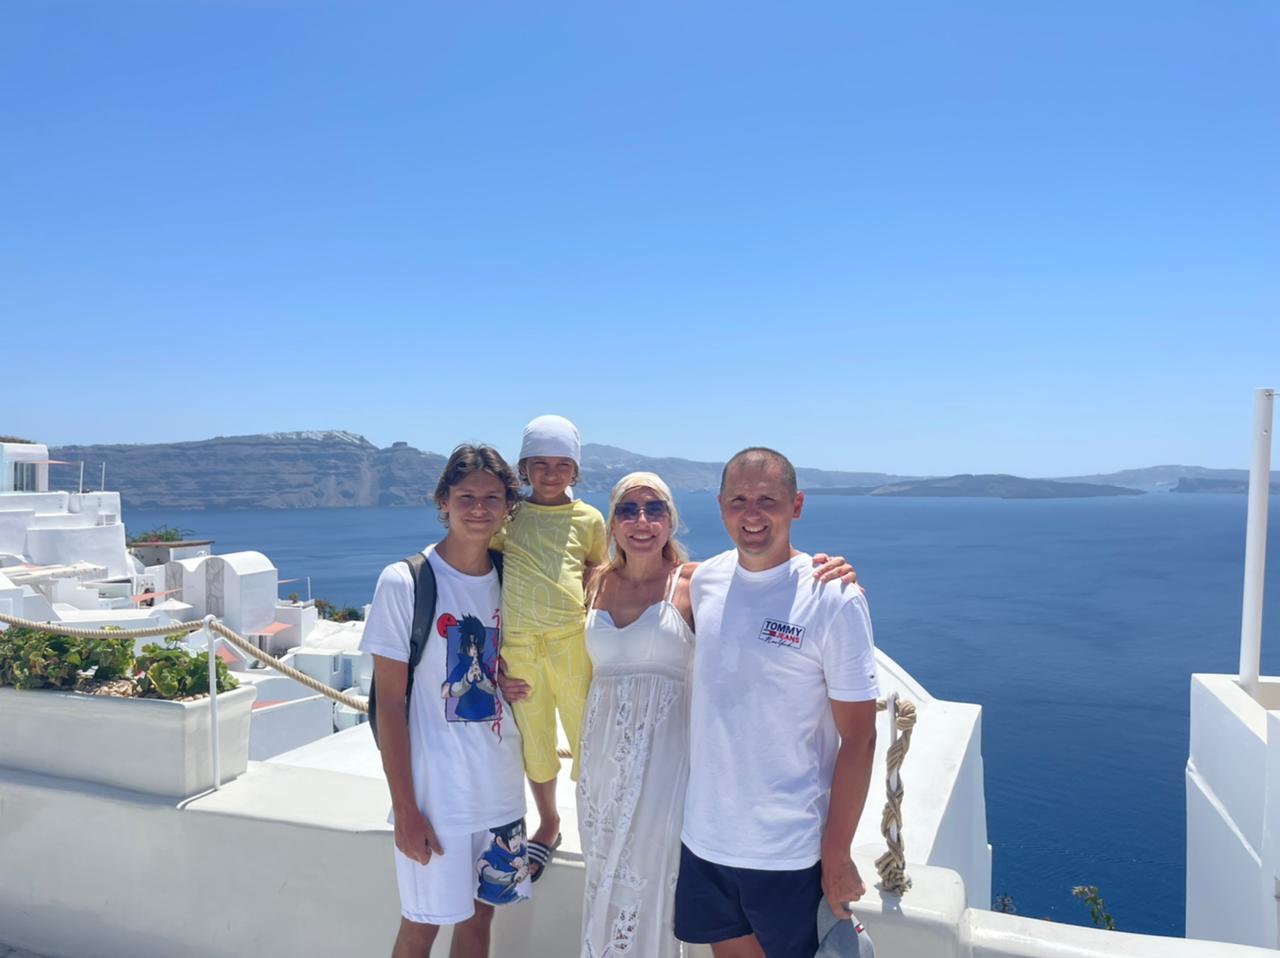 Экскурсия на Санторини из Ханьи и Ретимно